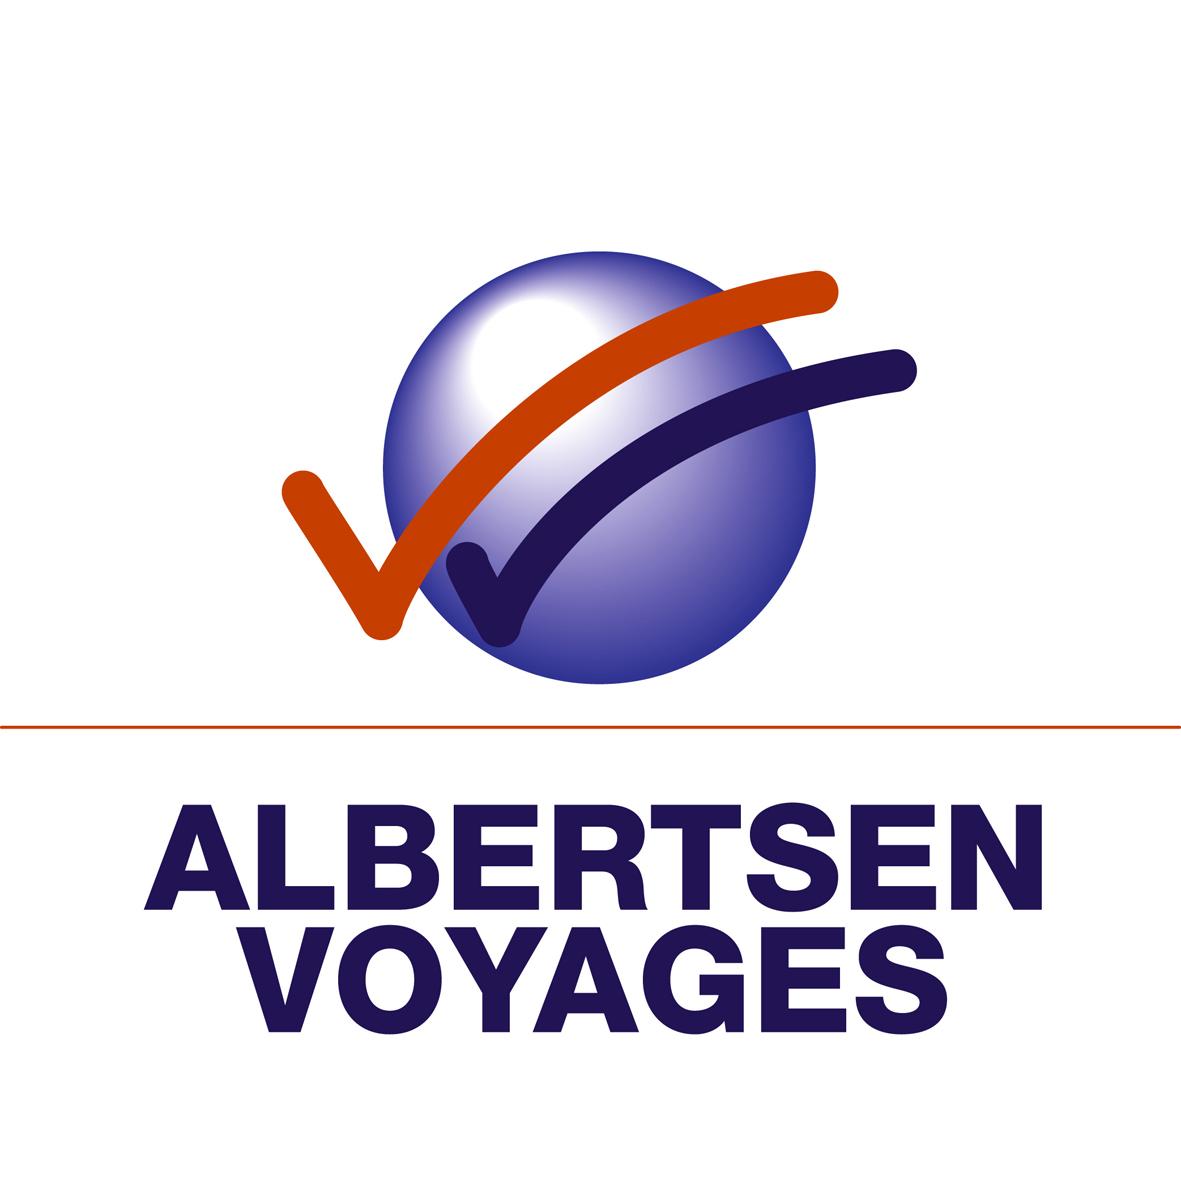 Image Albertsen Voyages SA